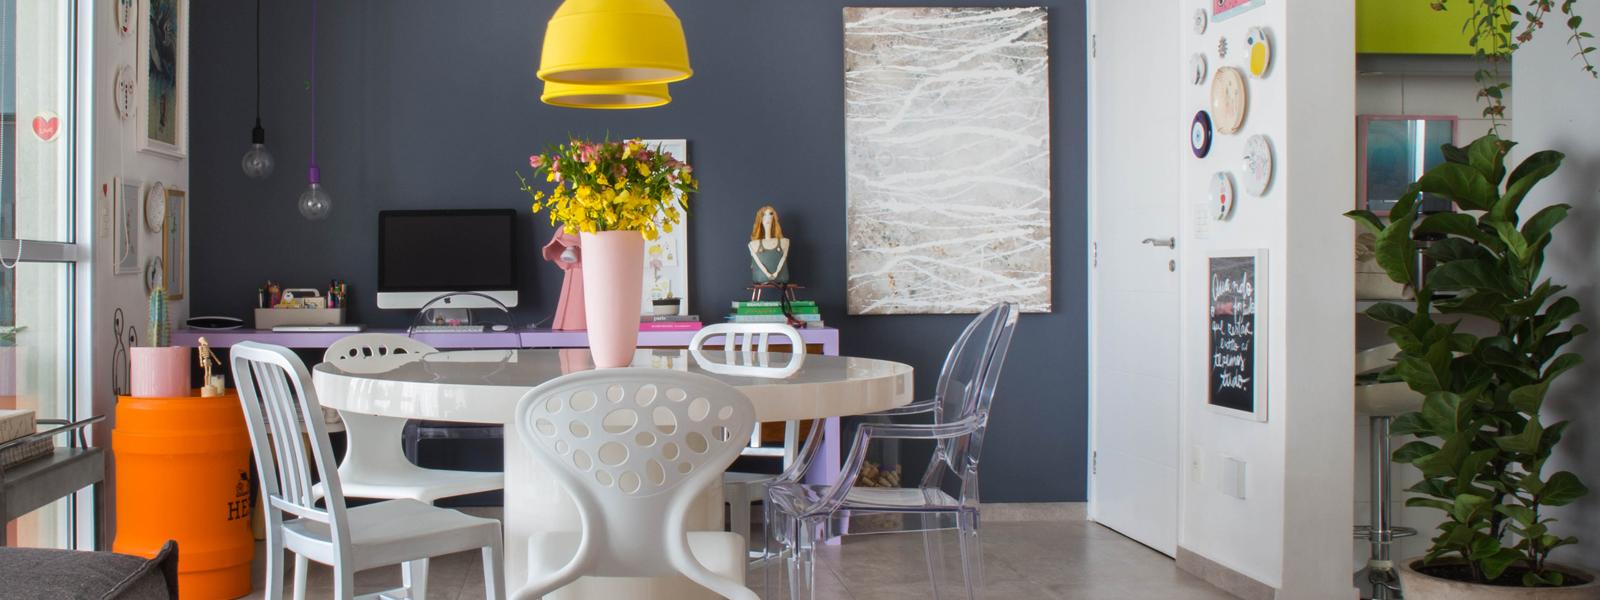 capa-banner-apartamento-colorido-estante-piso-cinza-2